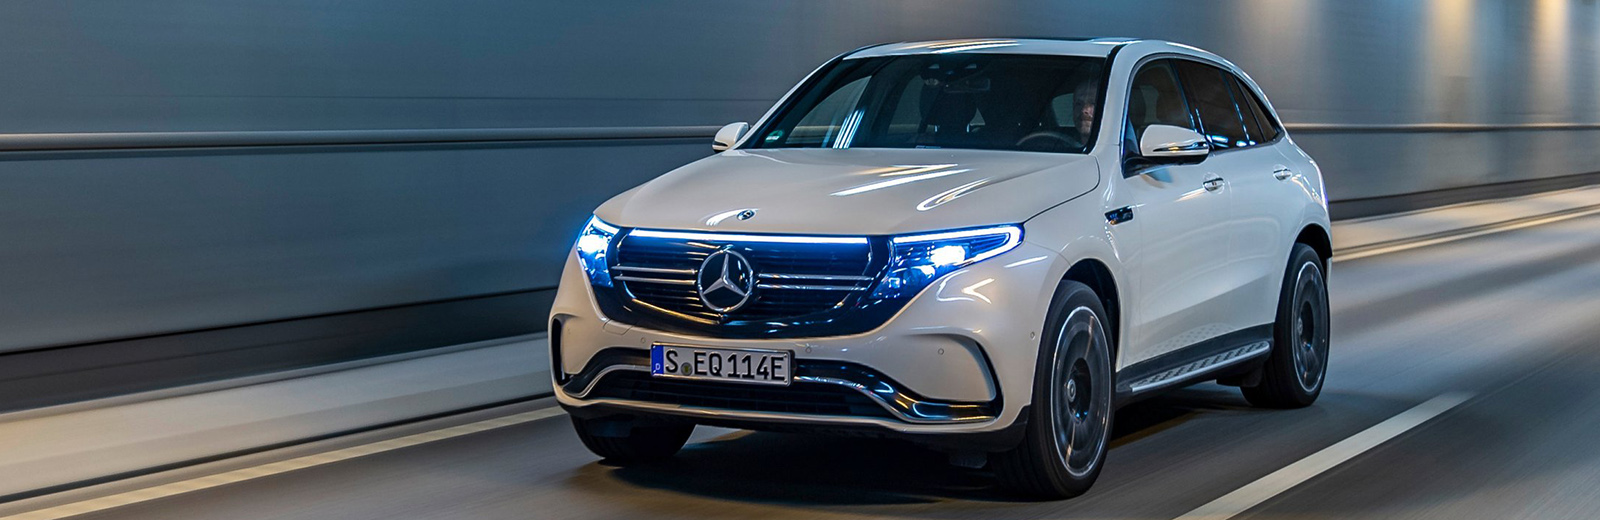 Mercedes-Benz range EV